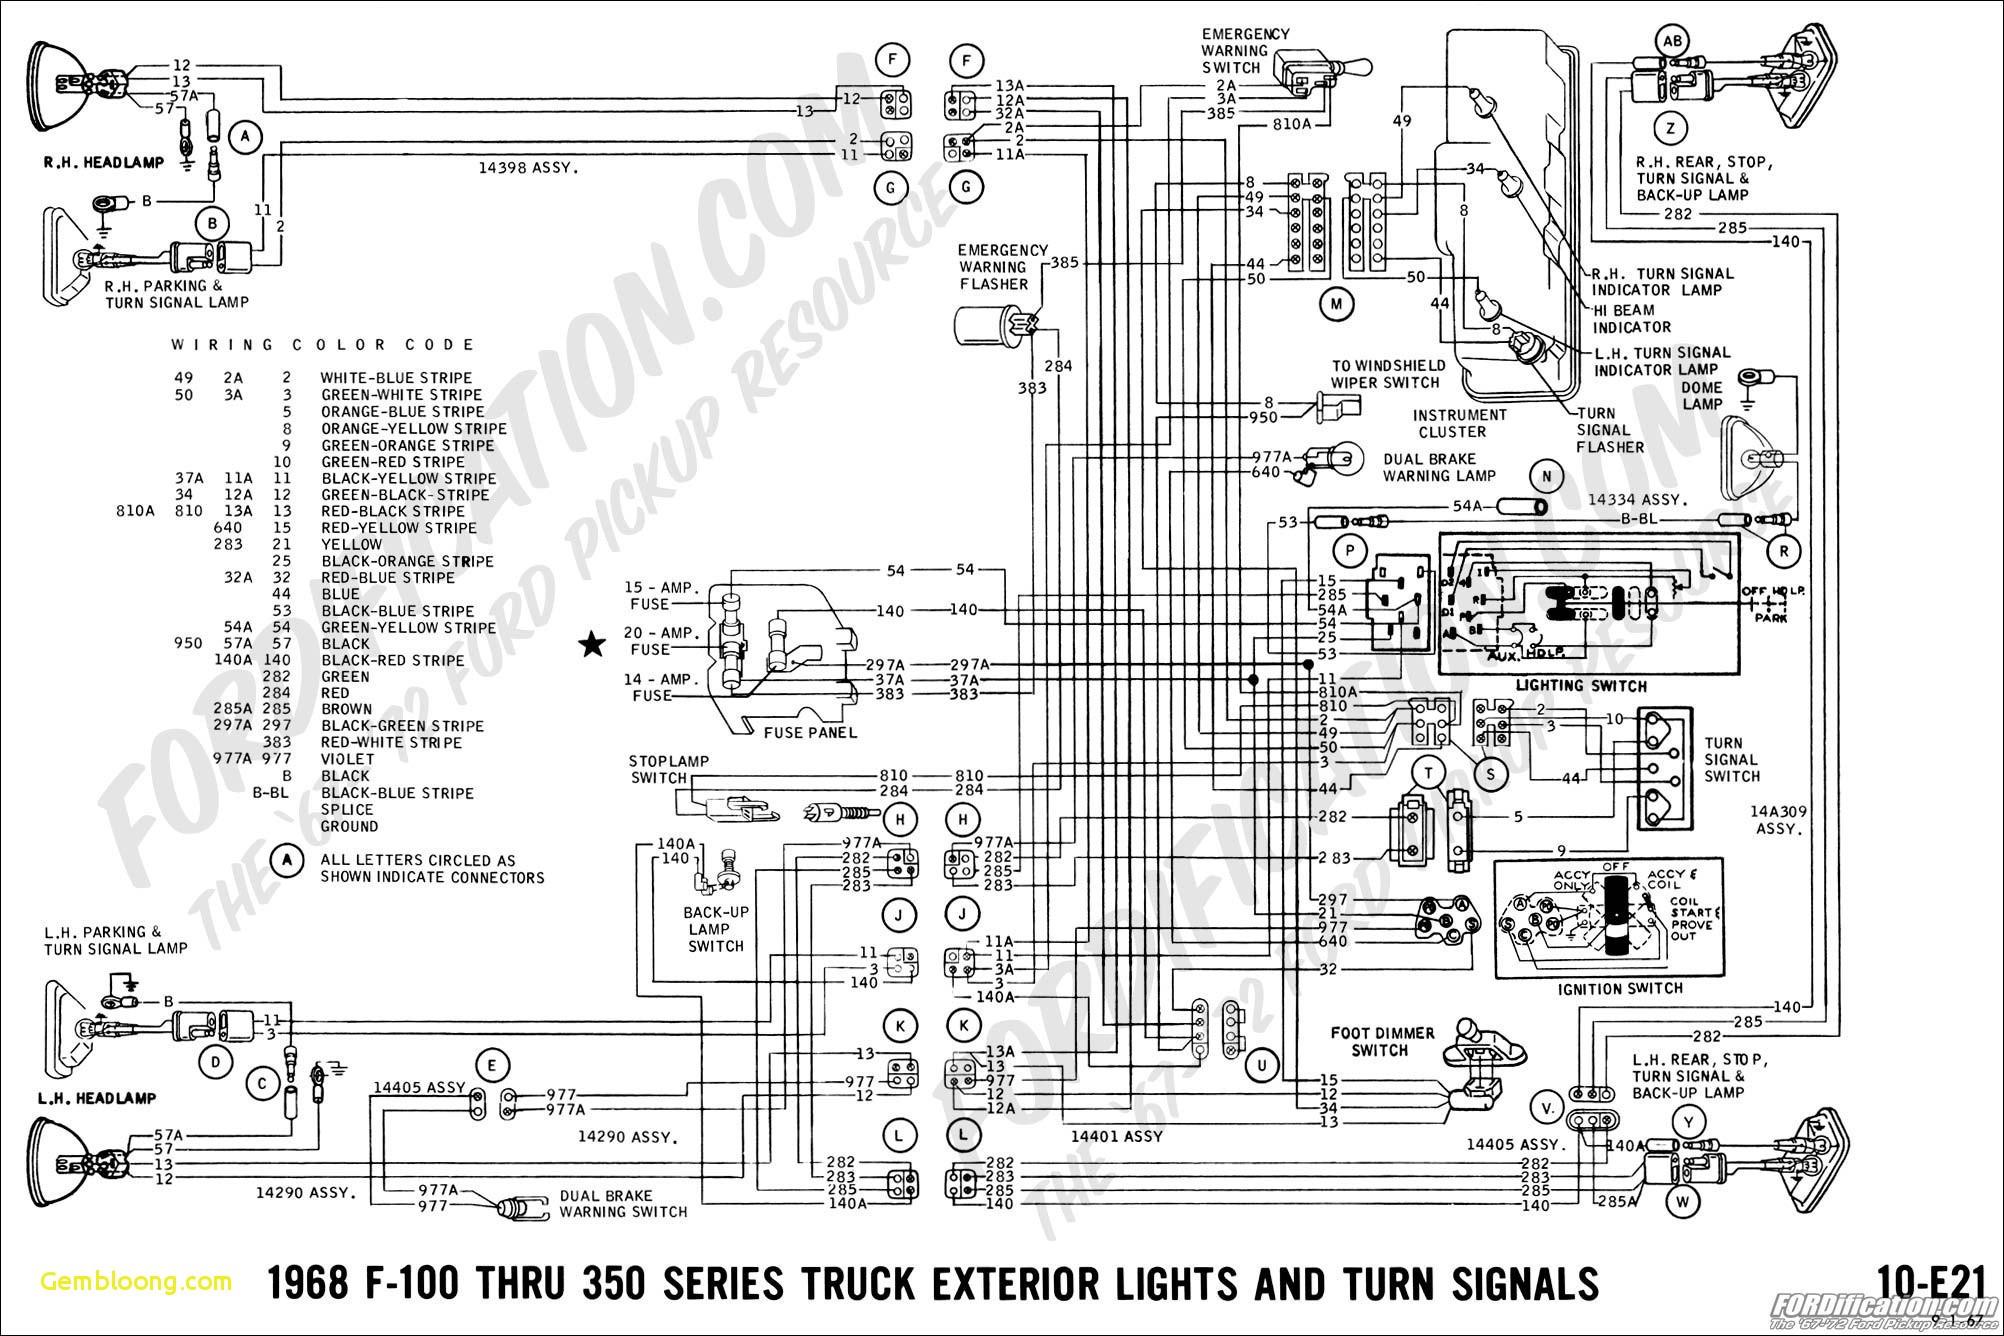 Truck Body Diagram 10 ford Trucks Wiring Diagrams Free – Wiring Diagram